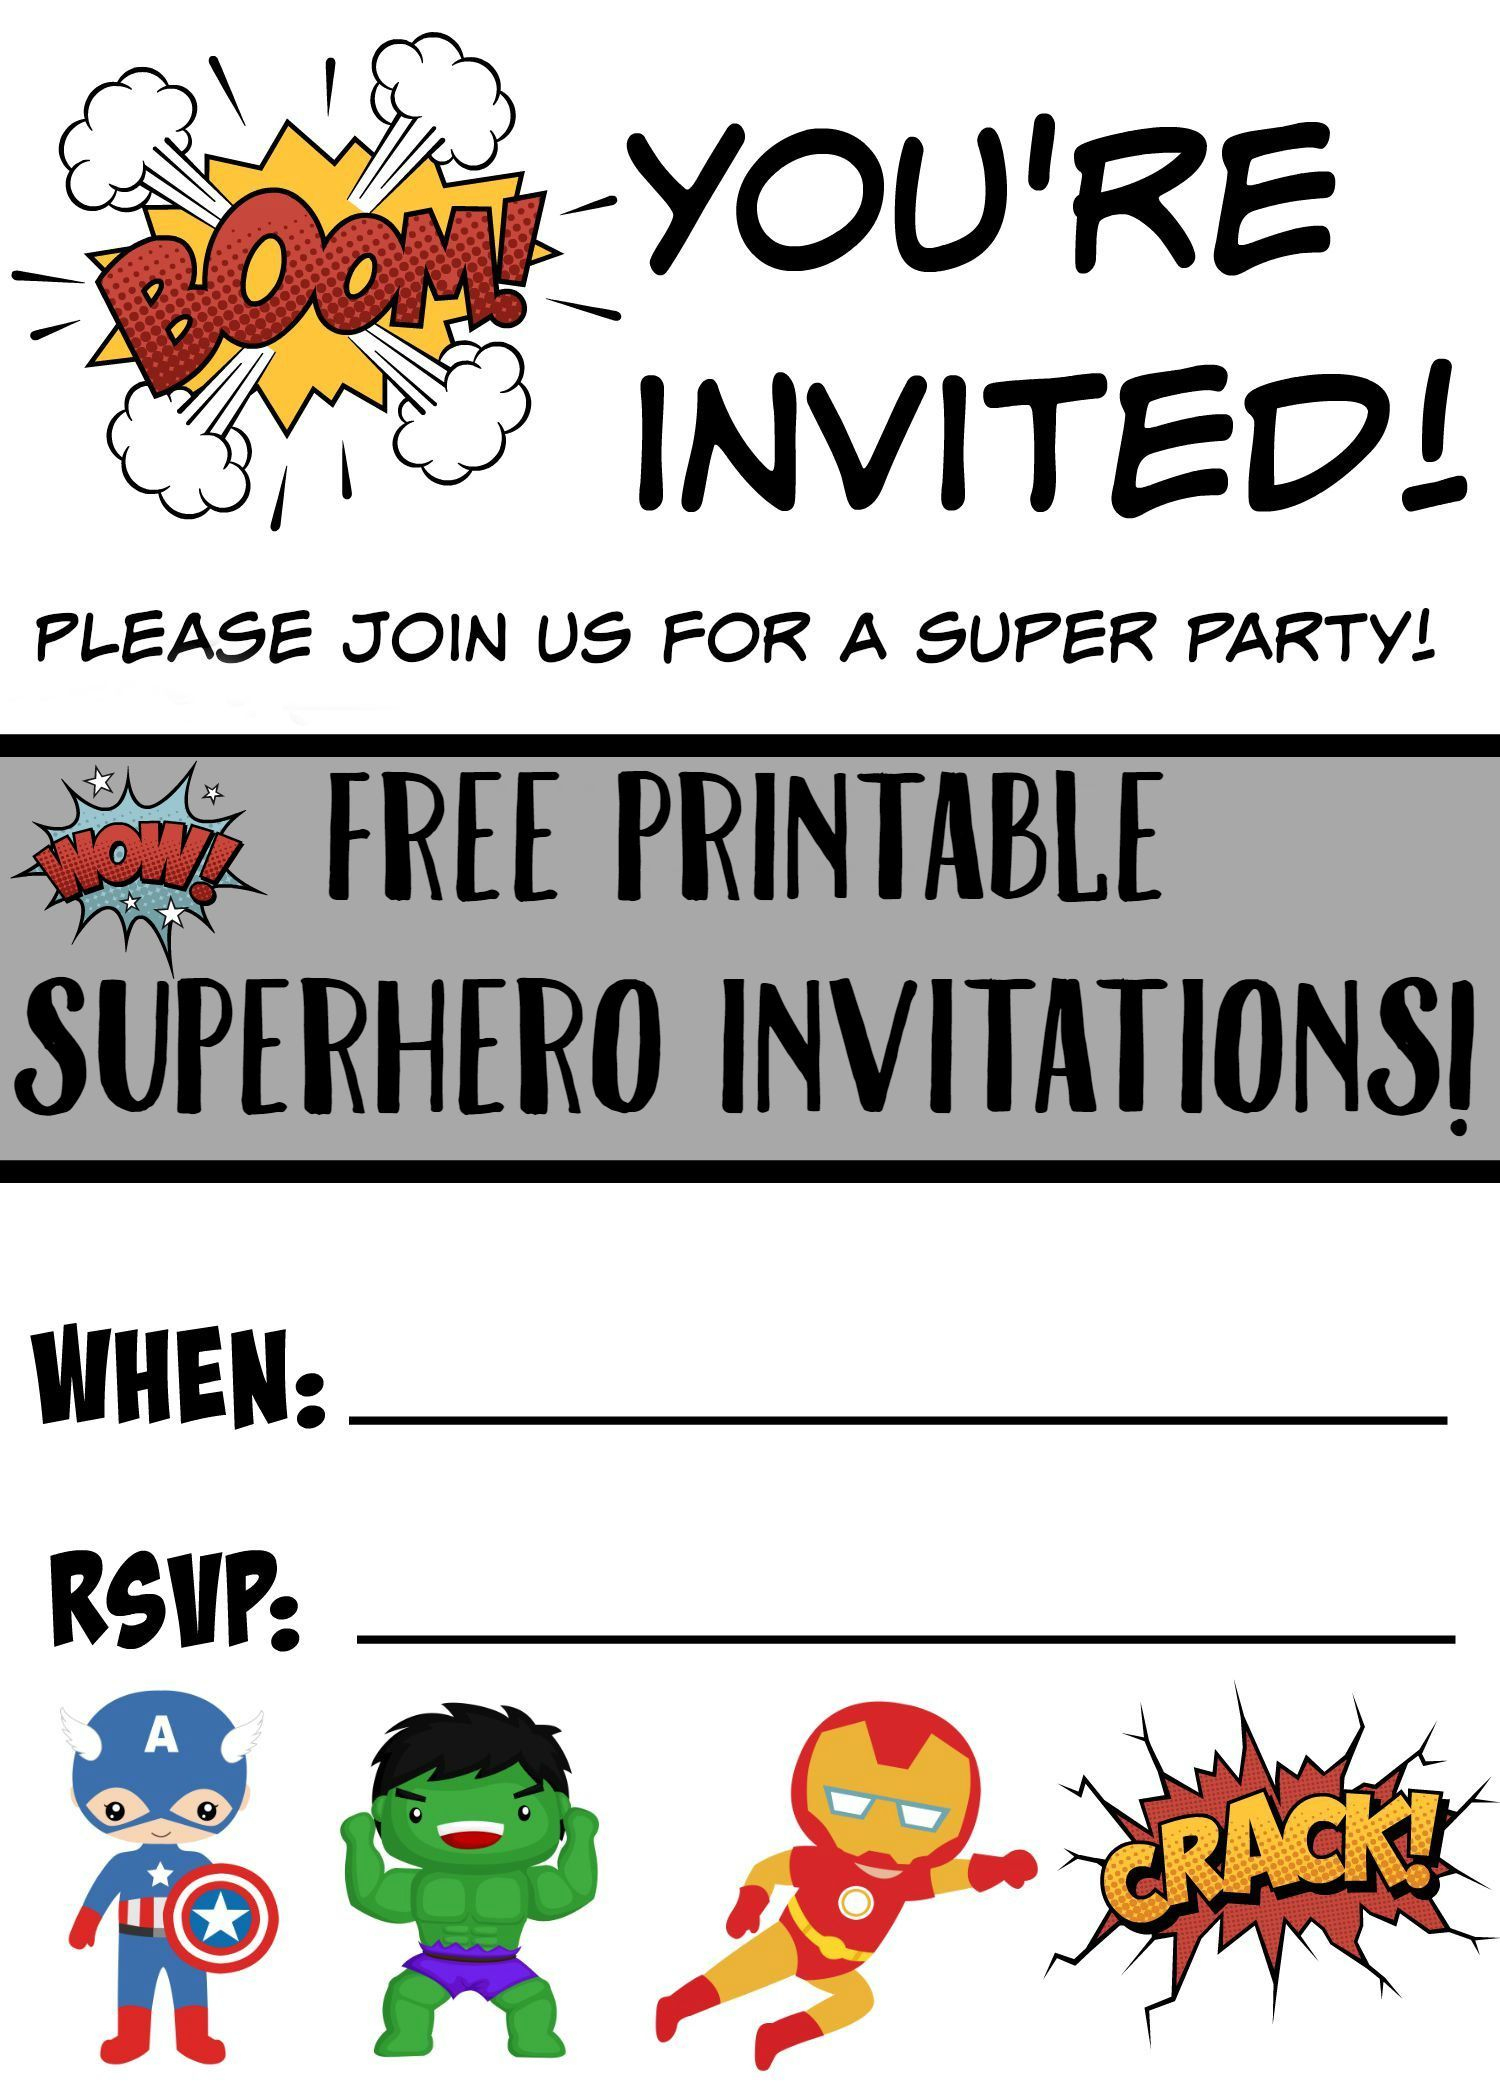 Free Printable Superhero Birthday Invitations | Superheroes Party - Avengers Printable Invitations Free